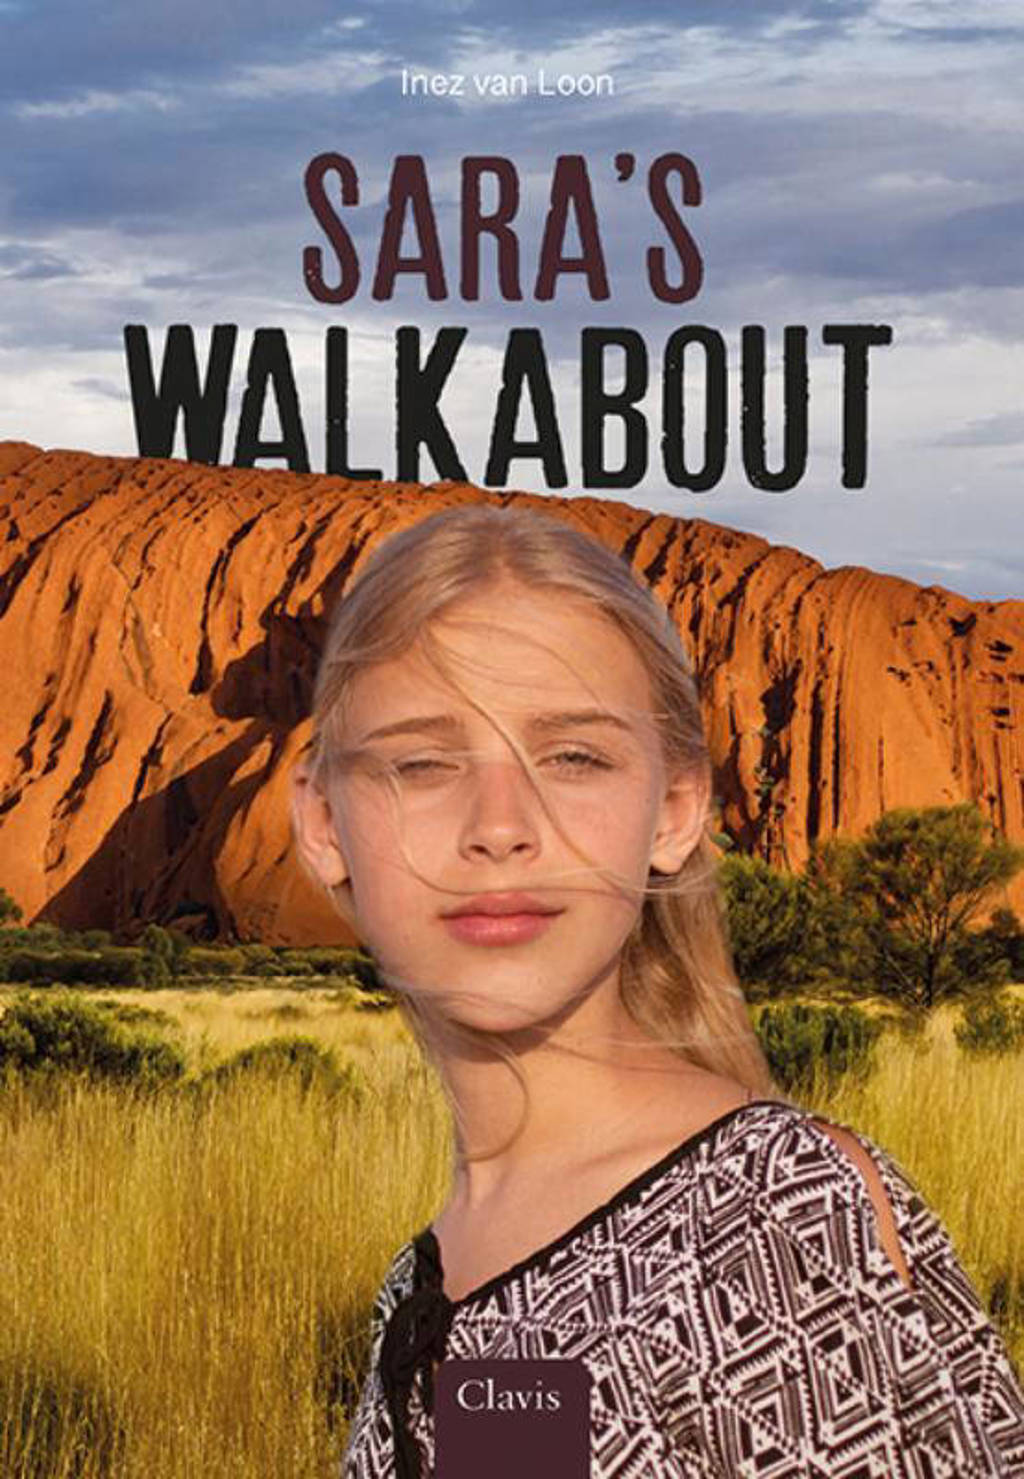 Sara's Walkabout - Inez van Loon